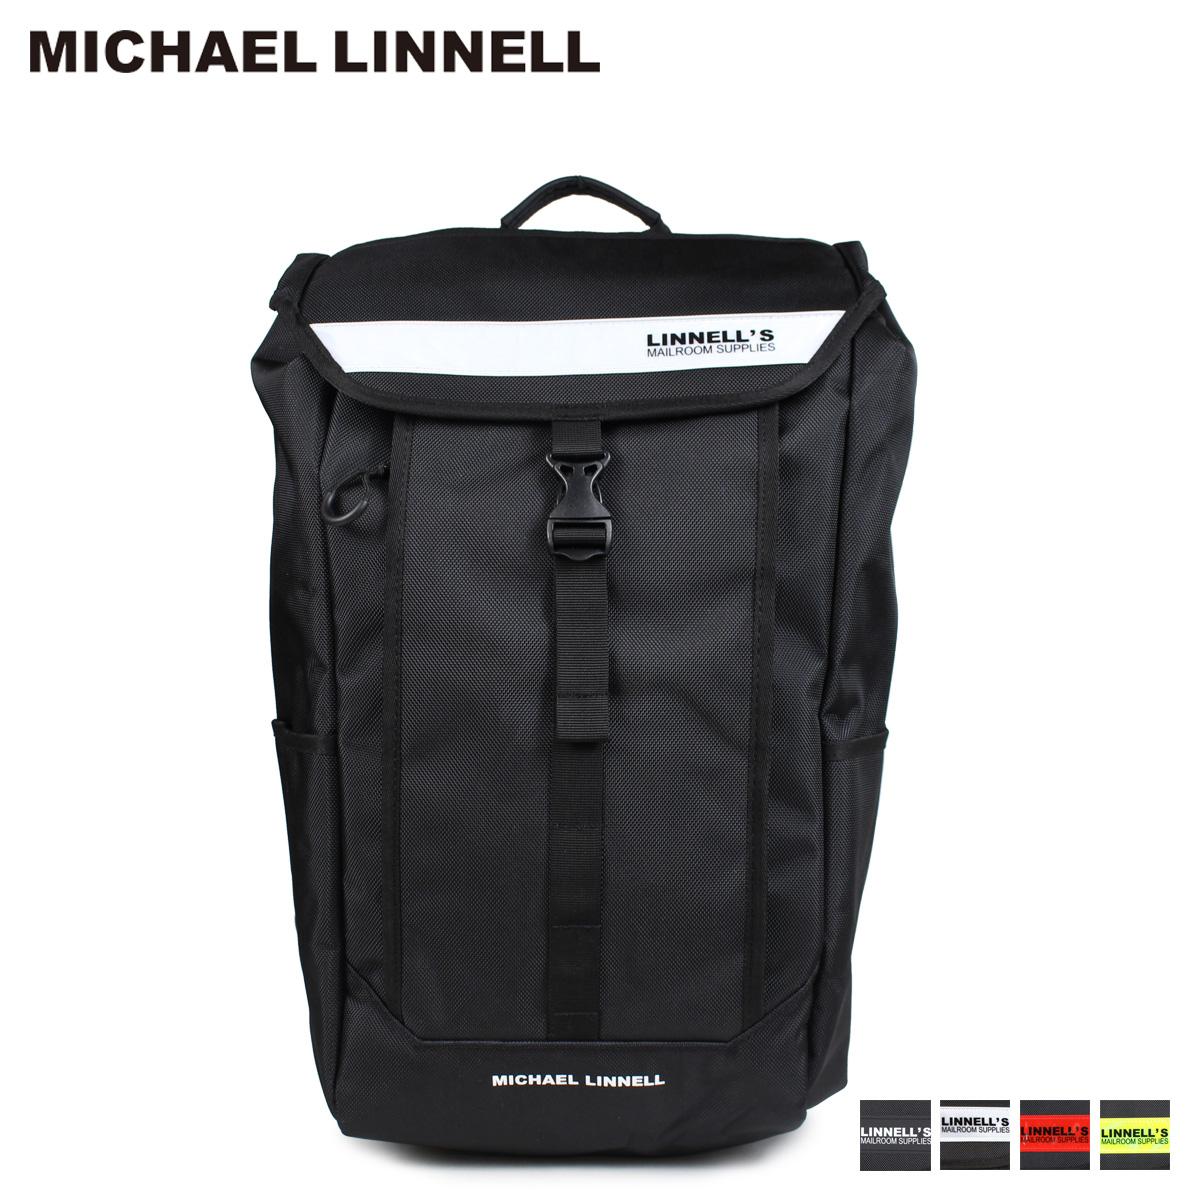 MICHAEL LINNELL マイケルリンネル リュック バッグ 28L メンズ レディース バックパック BOX BACKPACK ML-025 [10/22 新入荷]